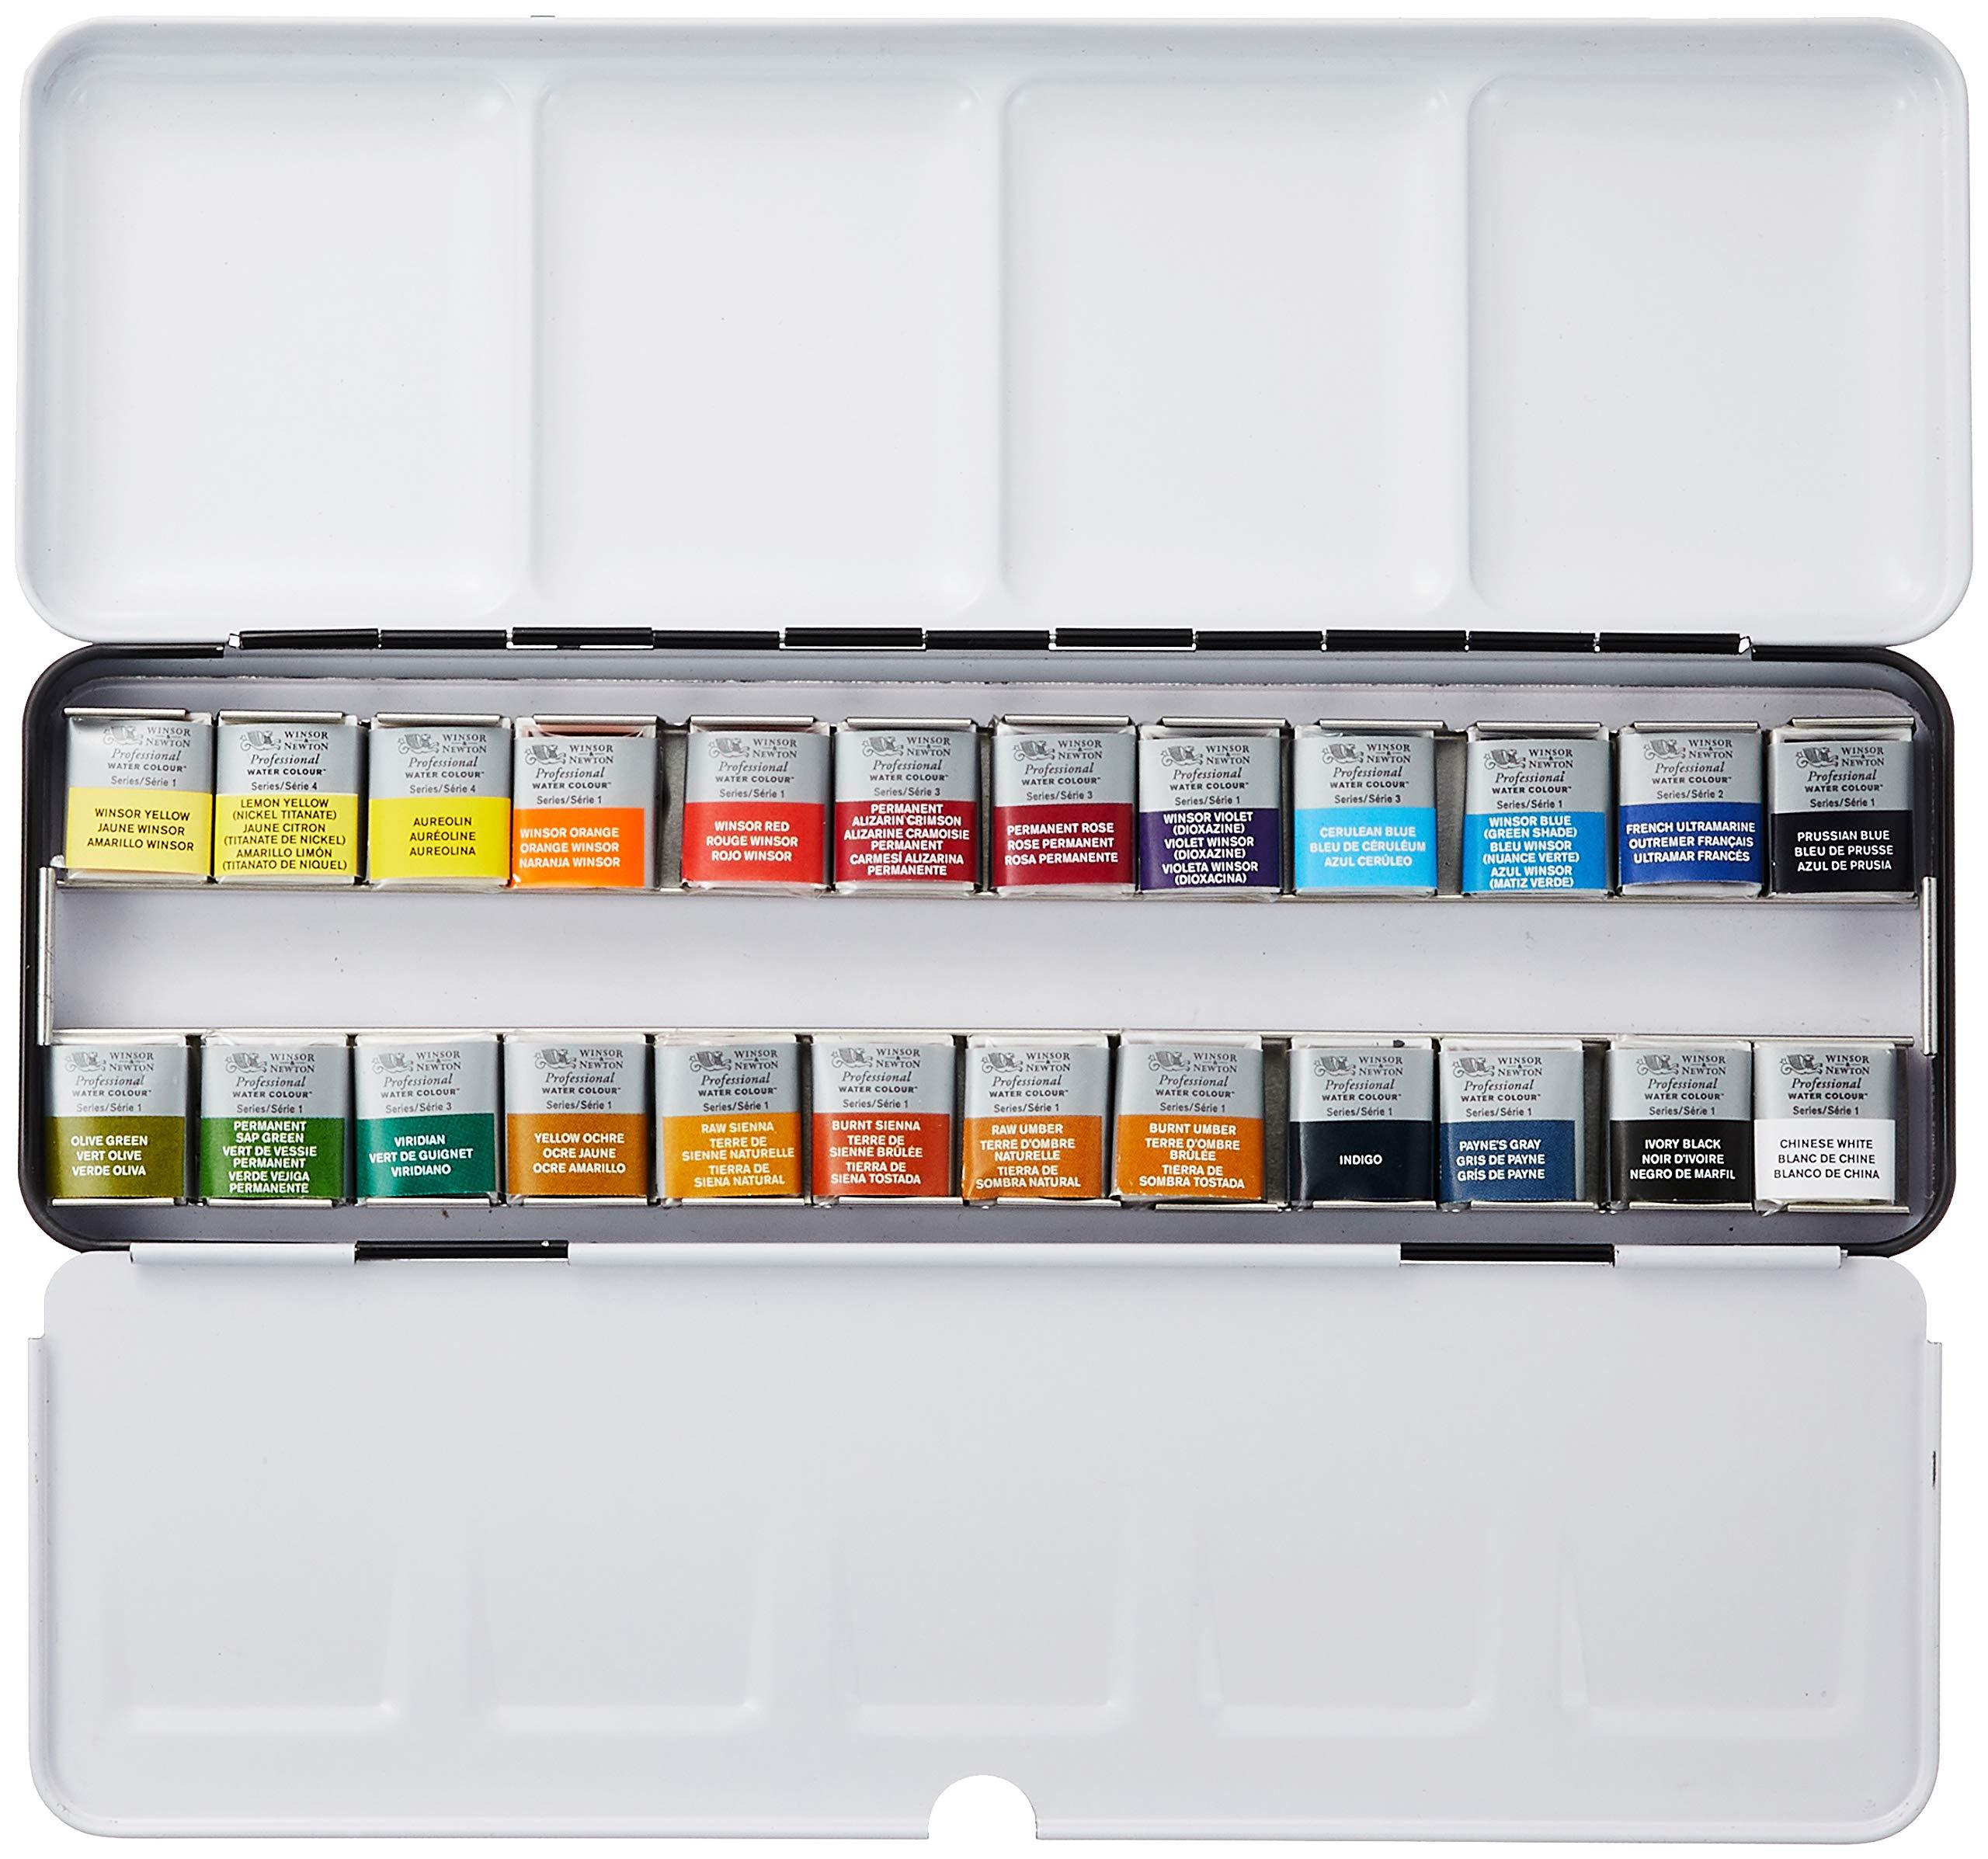 Winsor & Newton : Professional Watercolour : Lightweight Metal Sketchers Box Set : 24 Half Pans (24 Colors Set) by Winsor & Newton